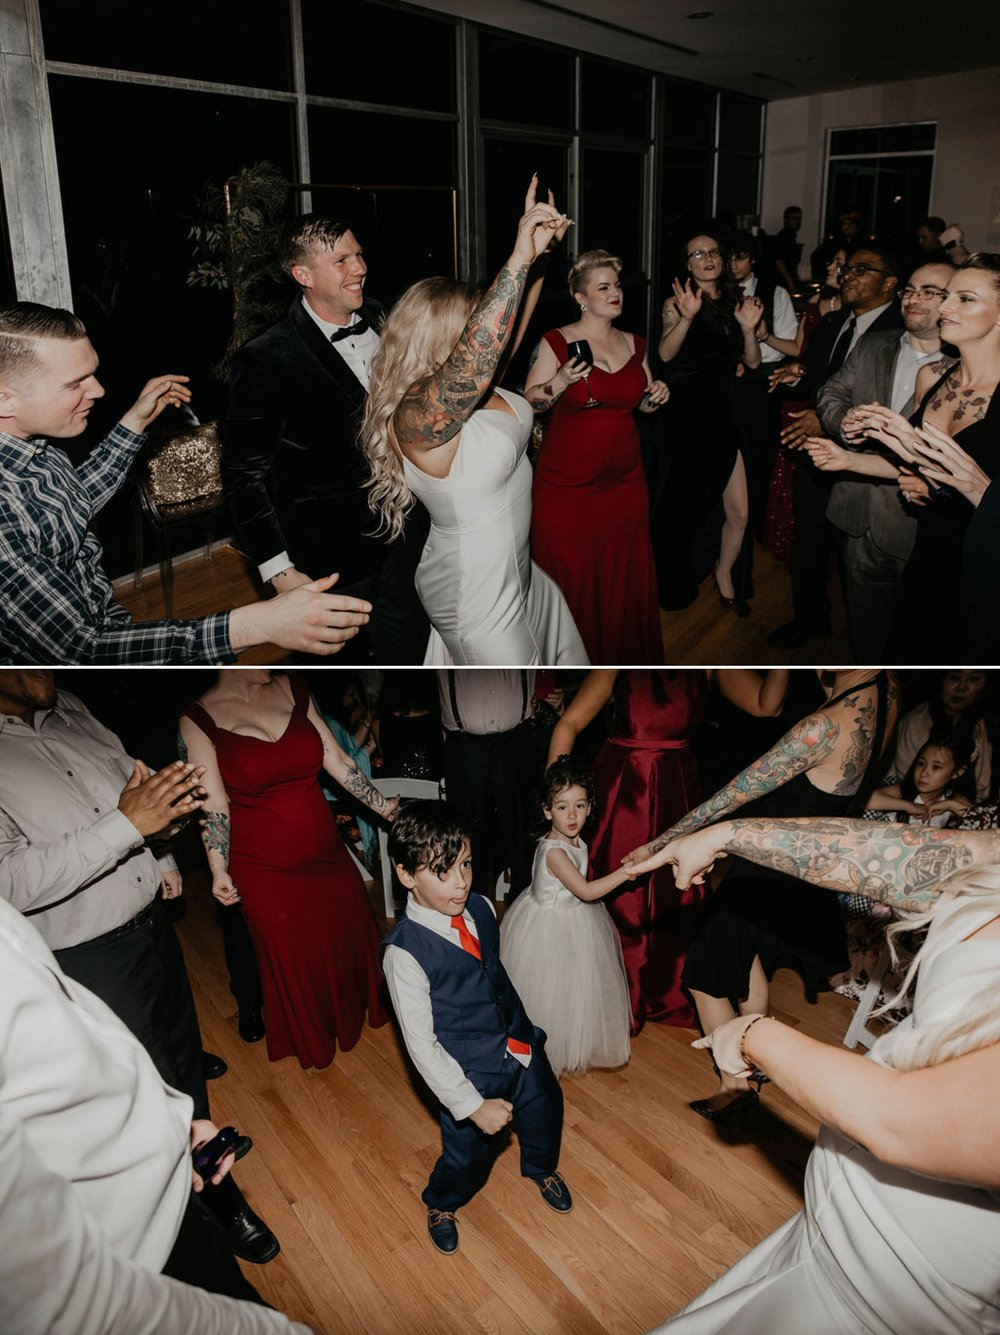 Reception and Dancing - Matt Smarsh and Johanna Dye - suites by the black tux - Raleigh North Carolina Urban Downtown Wedding